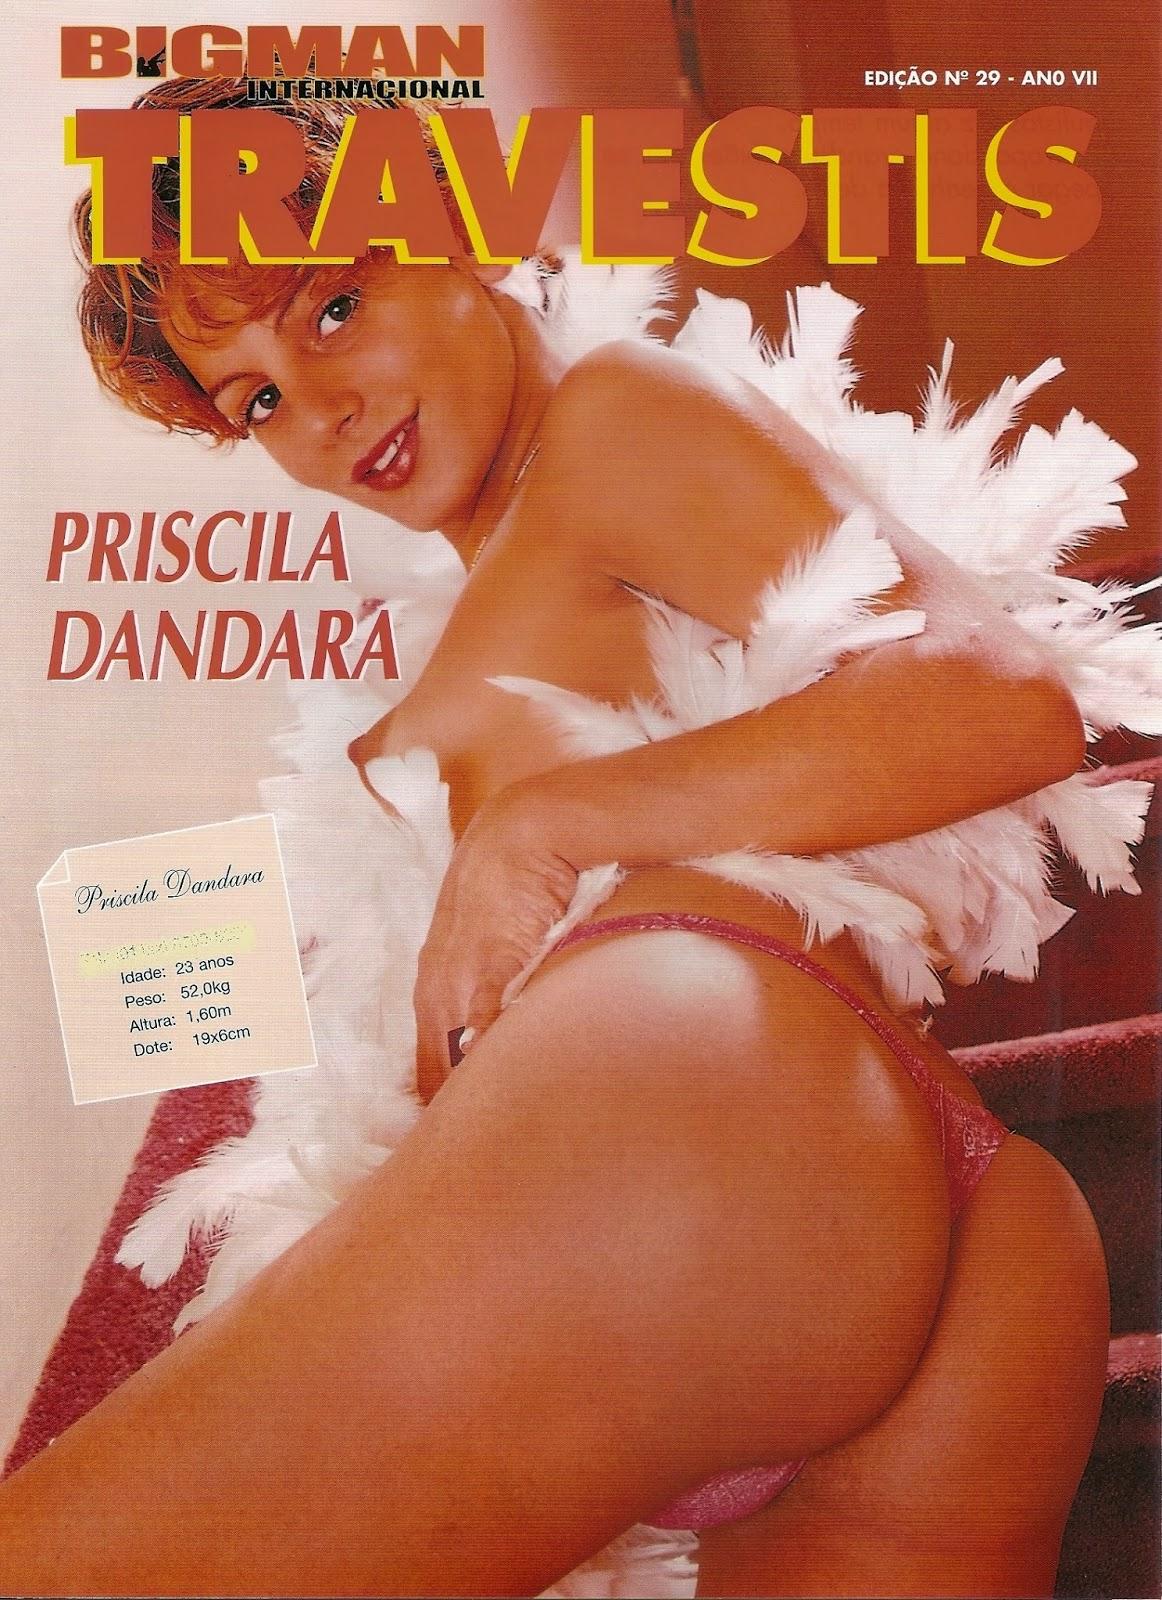 Priscila Dandara